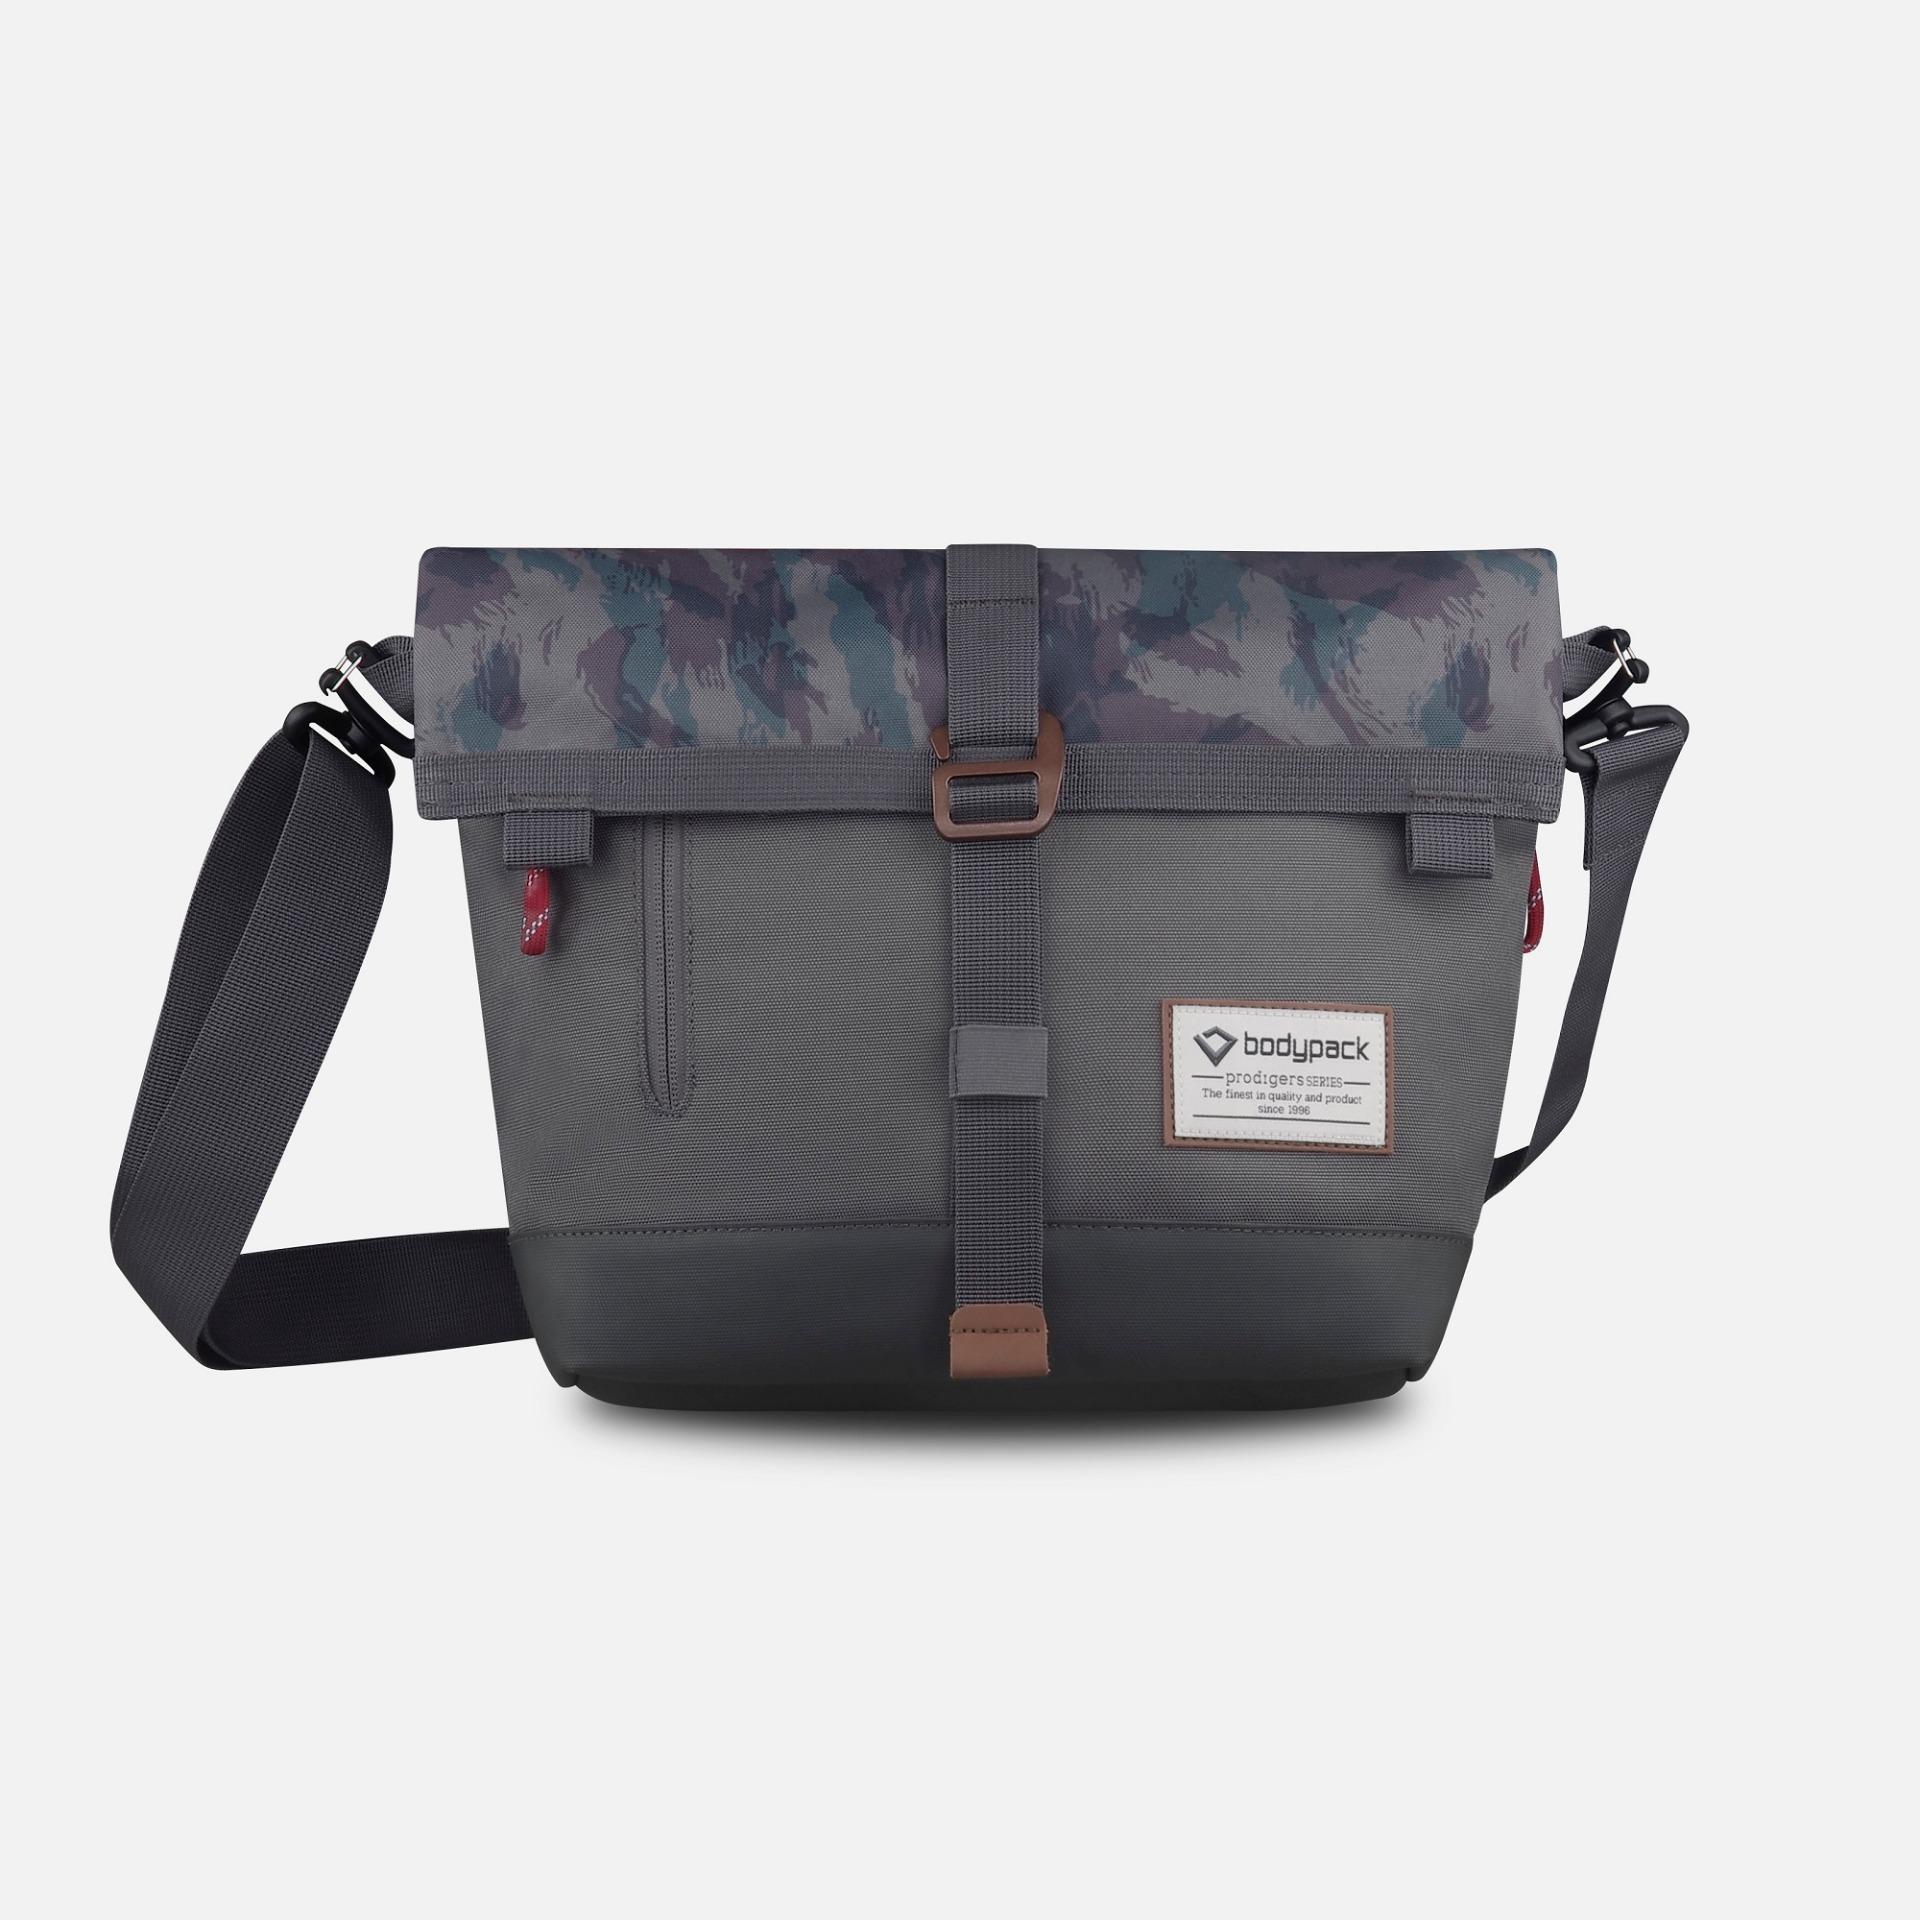 Bodypack Prodigers Kingston Light Grey Daftar Harga Terbaru Berlin Black Coffee 2820bftn Tas Selempang Kamera Pria Battle Jungle 20 Abu Tua